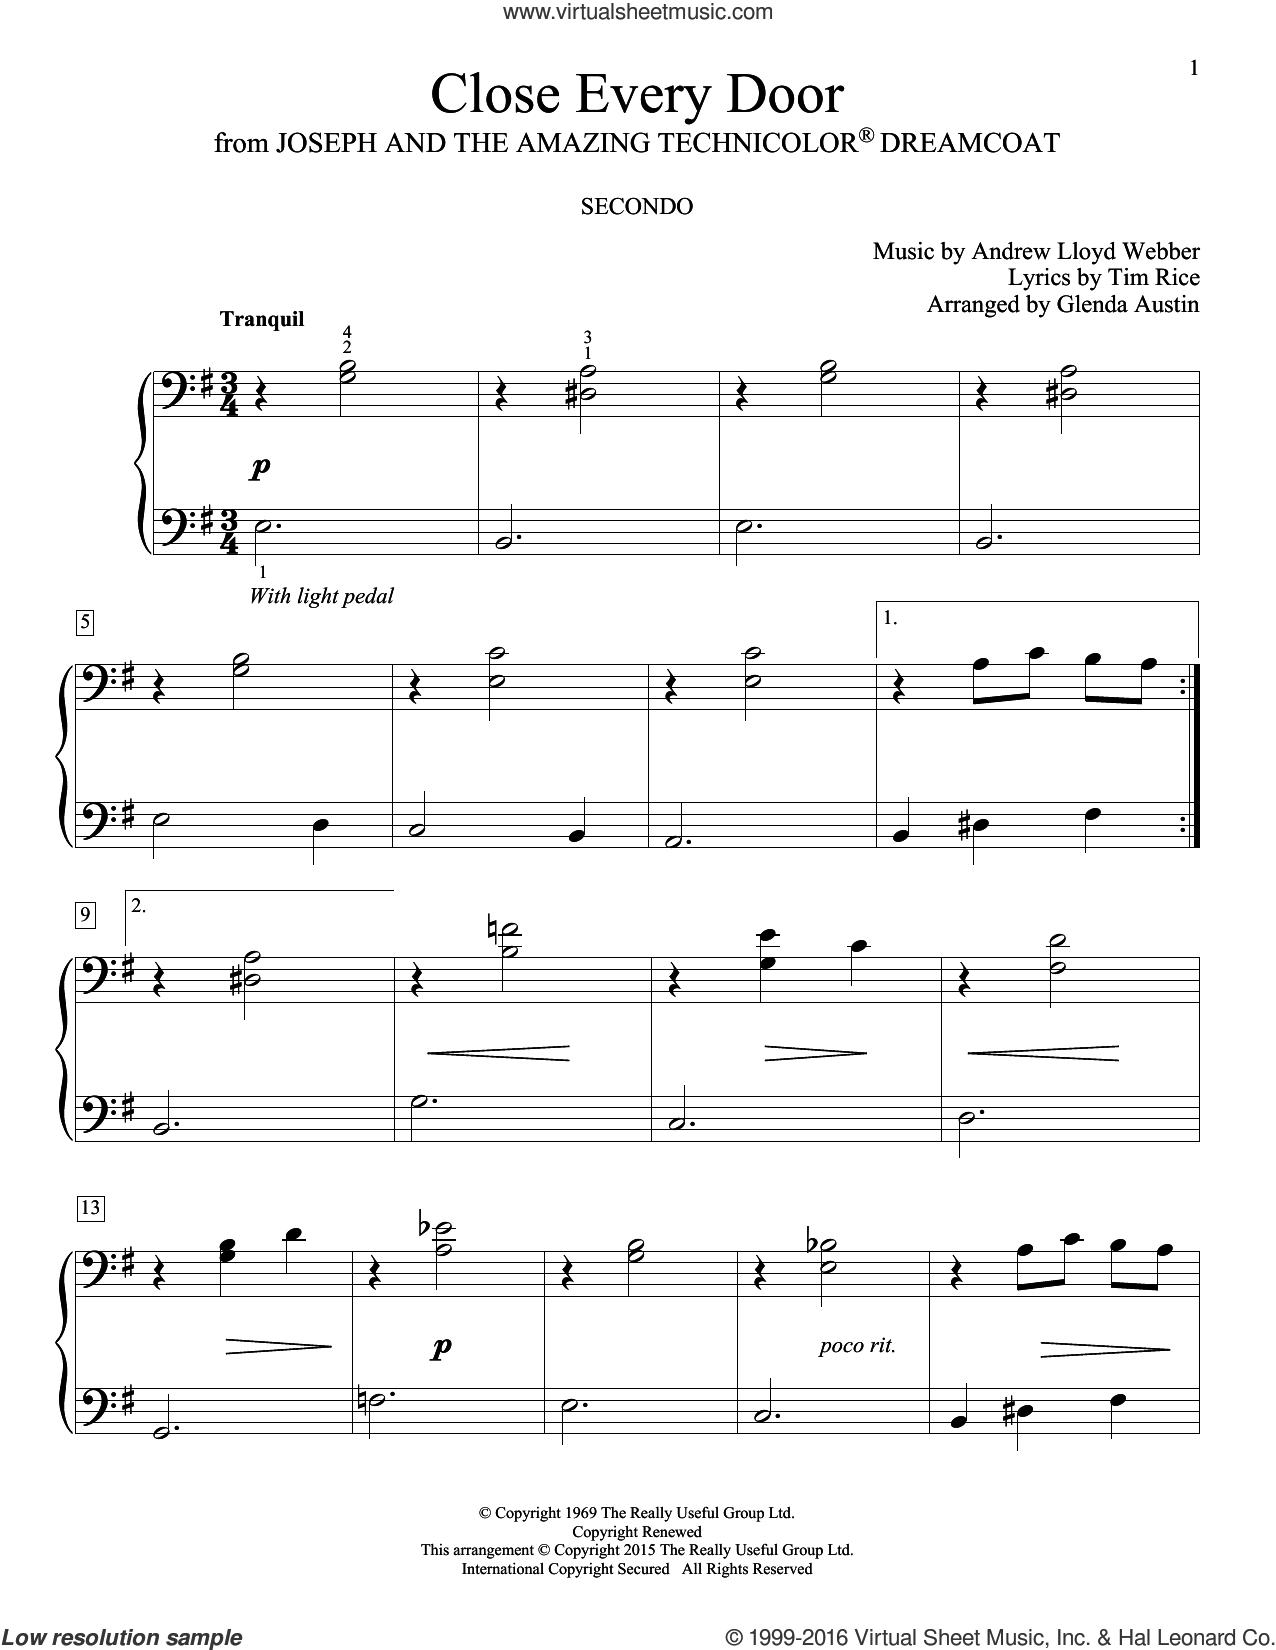 Close Every Door (arr. Glenda Austin) sheet music for piano four hands by Andrew Lloyd Webber, Glenda Austin, Carolyn Miller, Eric Baumgartner and Tim Rice, intermediate skill level